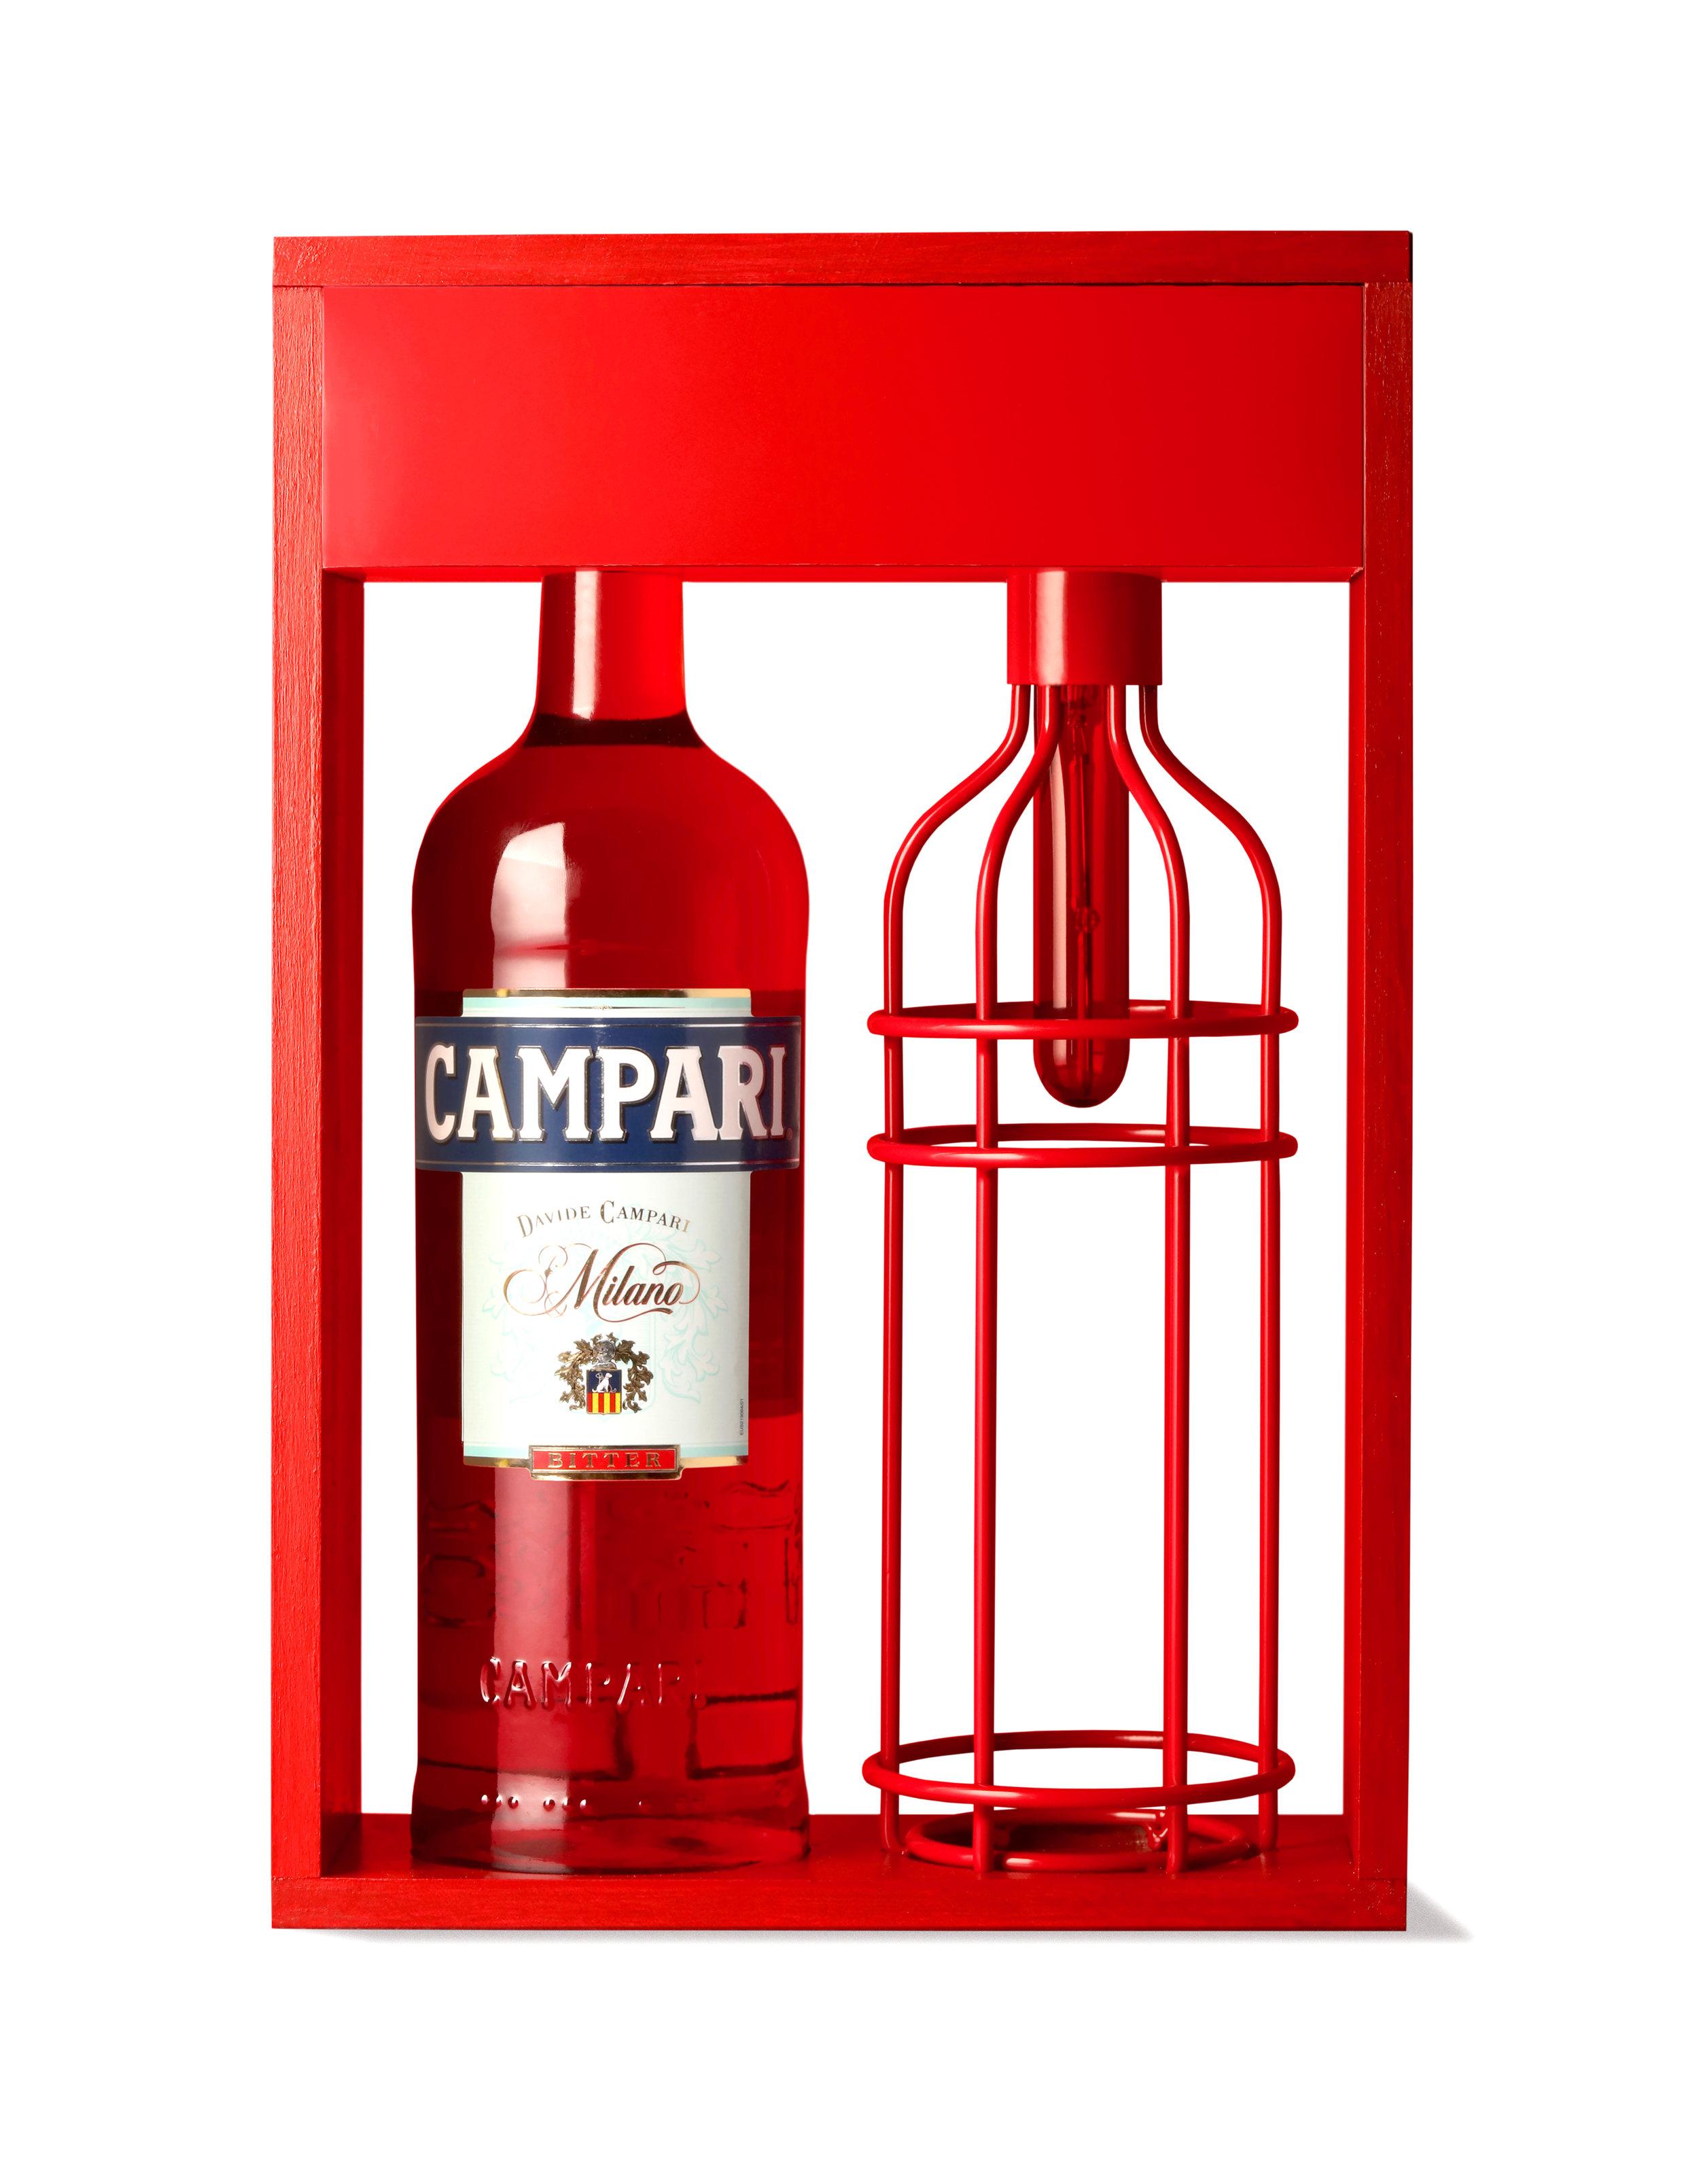 Coffret-CAMPARIby5-5-elisa-les-bons-tuyaux.jpg